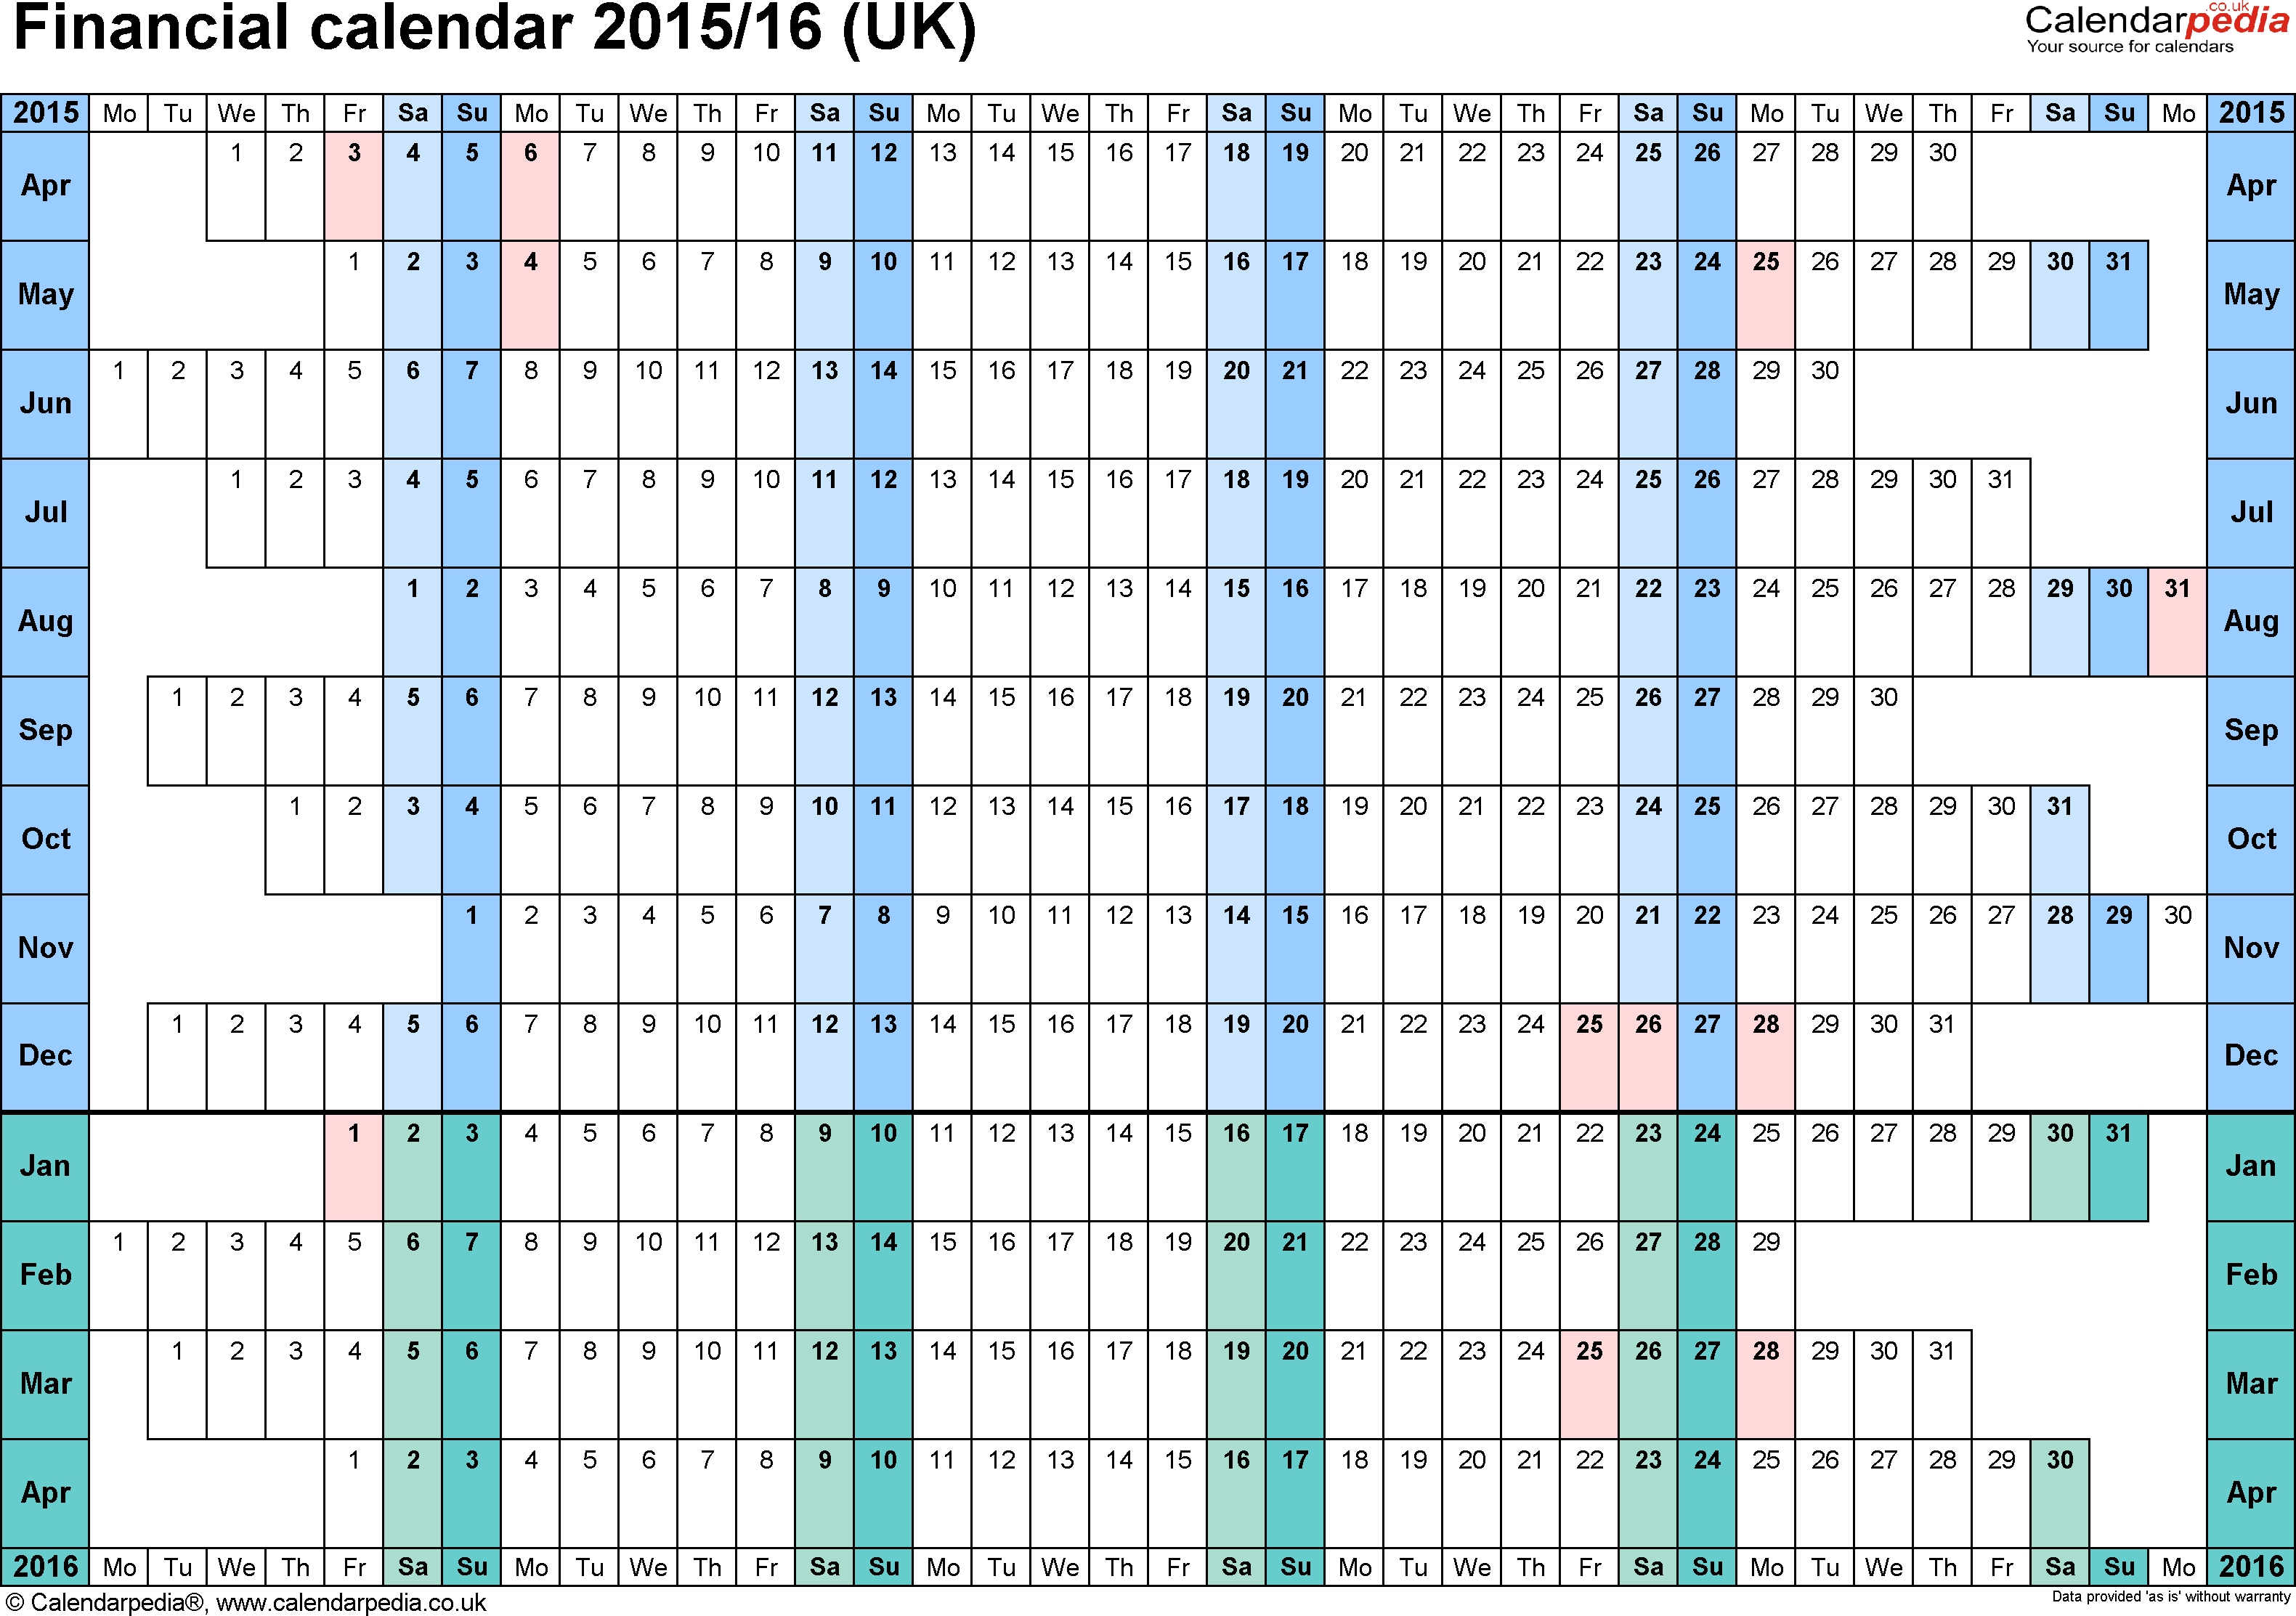 Financial Calendars 2015/16 (Uk) In Pdf Format pertaining to Hmrc Tax Calendar 2019/2020